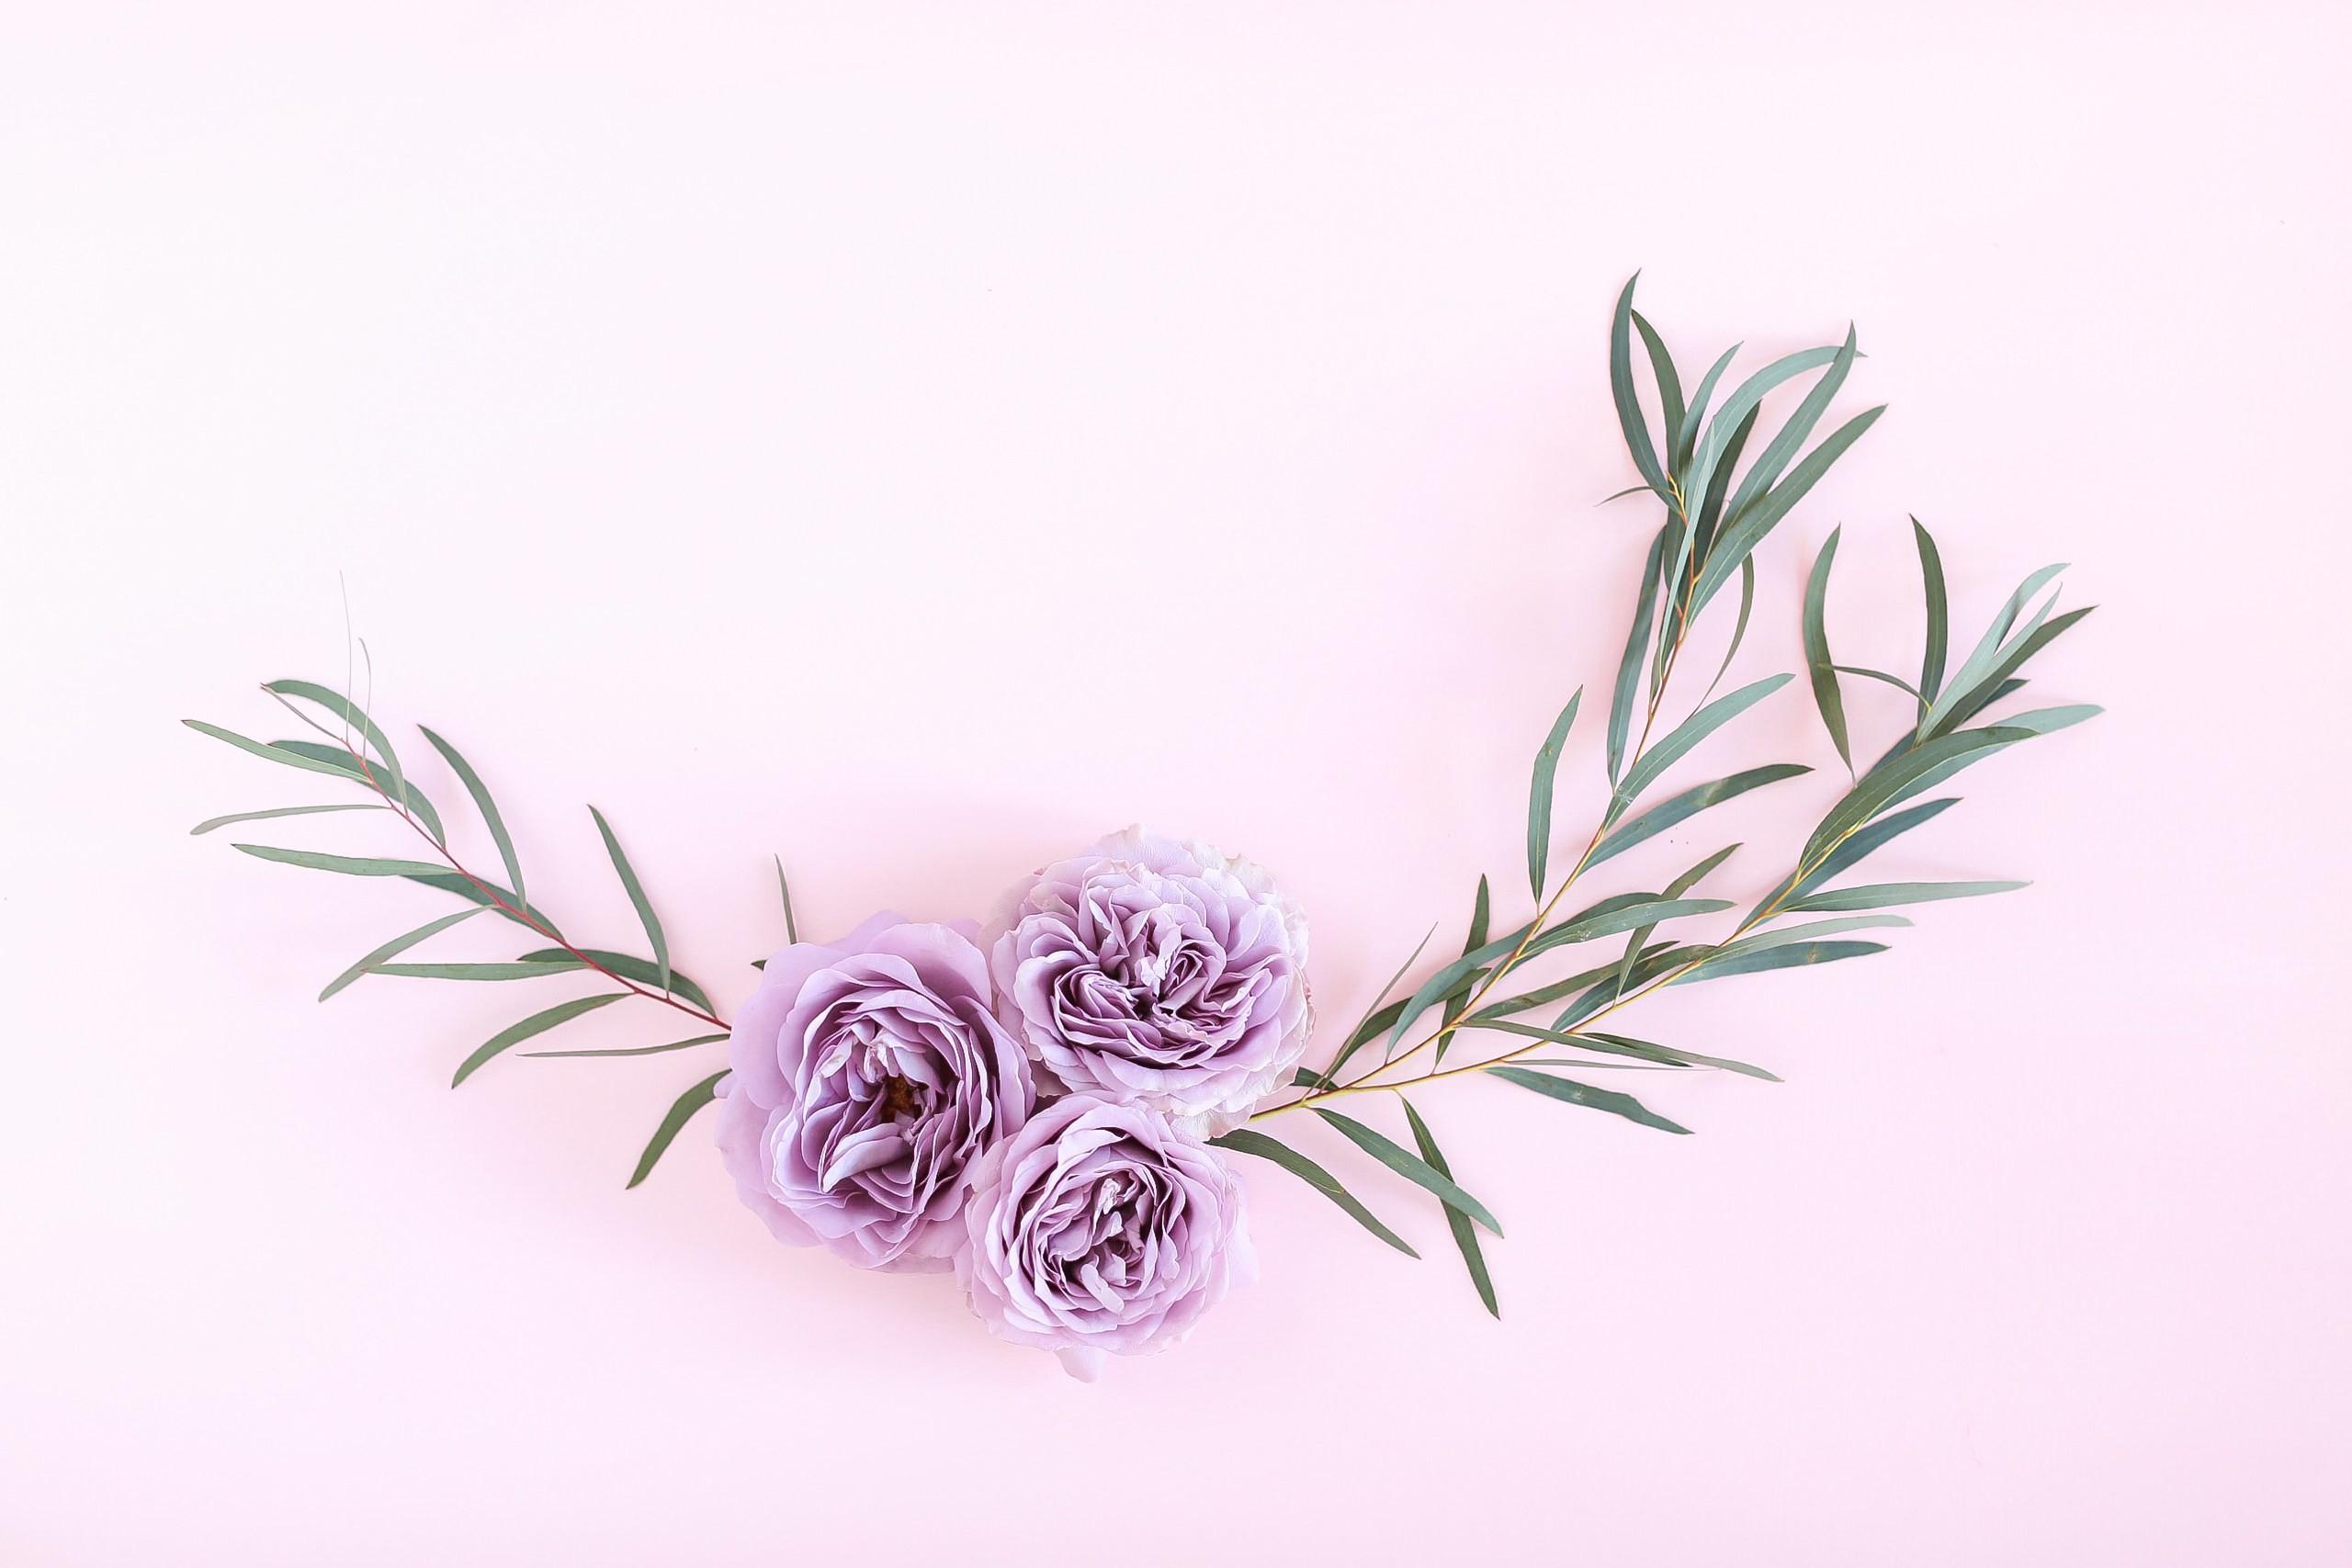 Res: 2560x1707, Digital Blooms June 2018 | Free Pantone Inspired Desktop Wallpapers for  Spring and Summer | Free